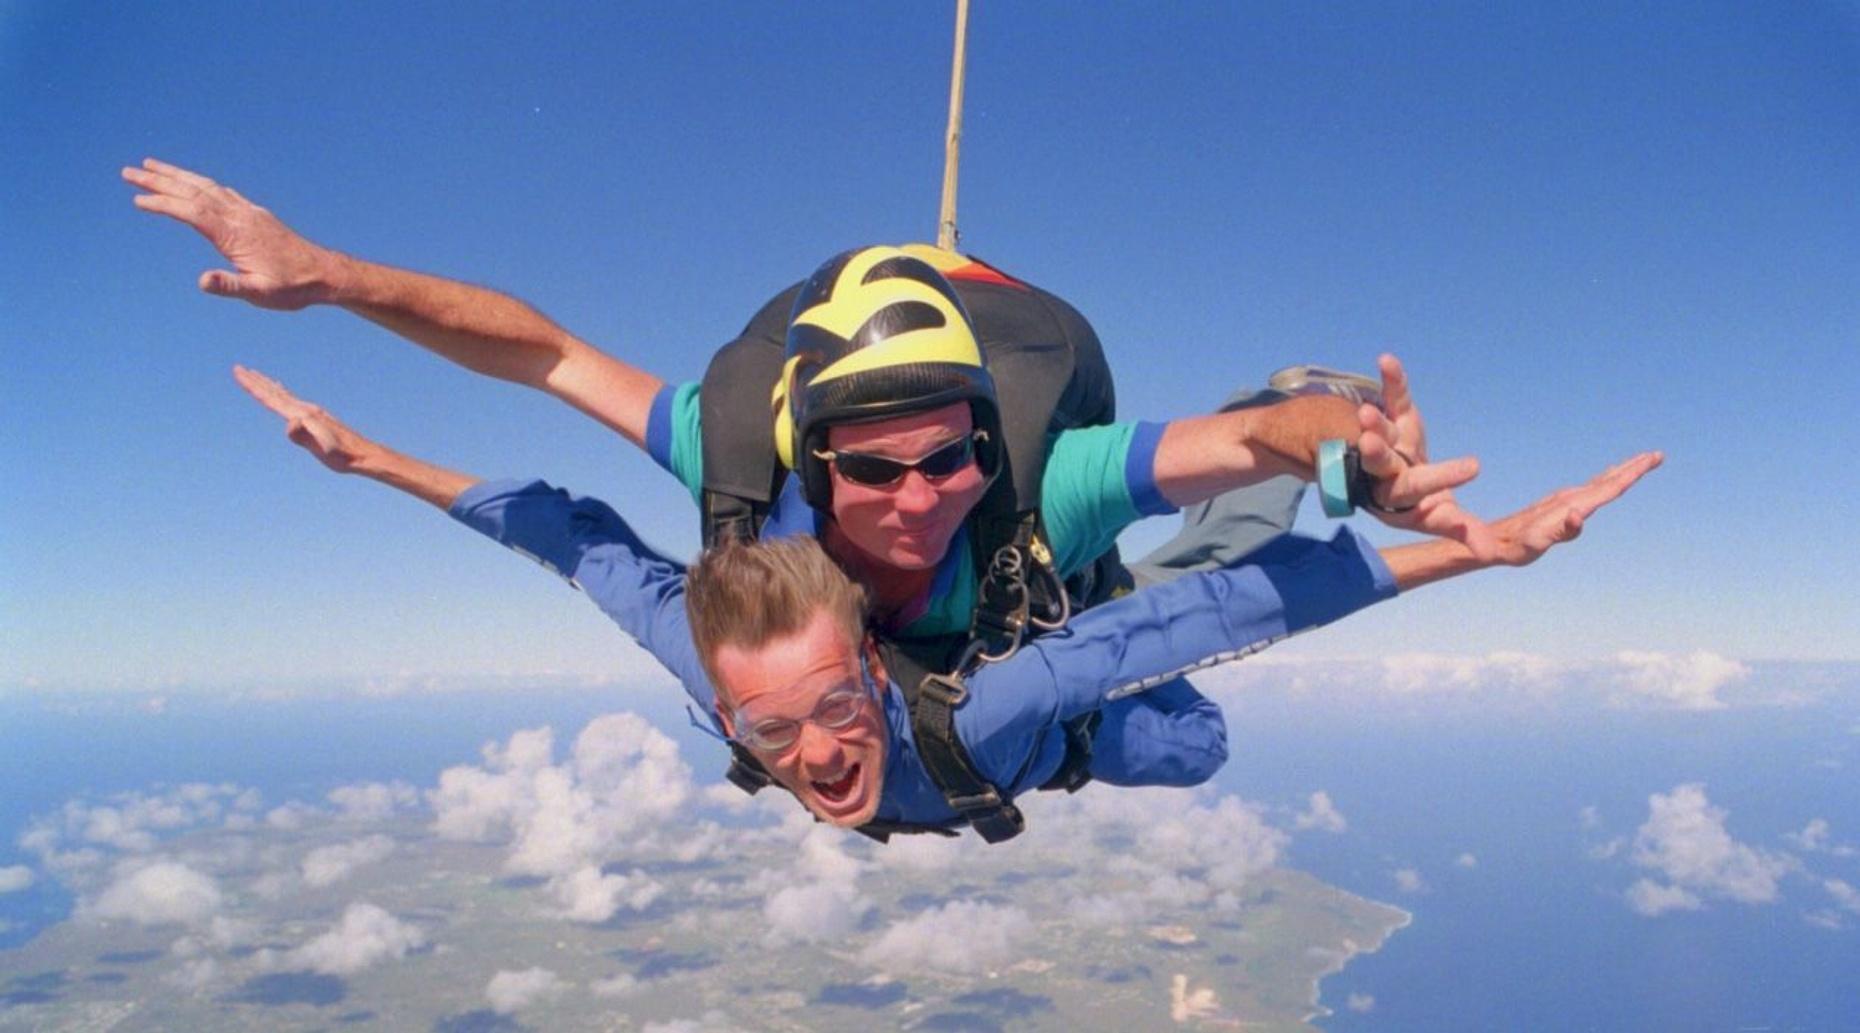 Tandem Skydiving Adventure in Fort Collins